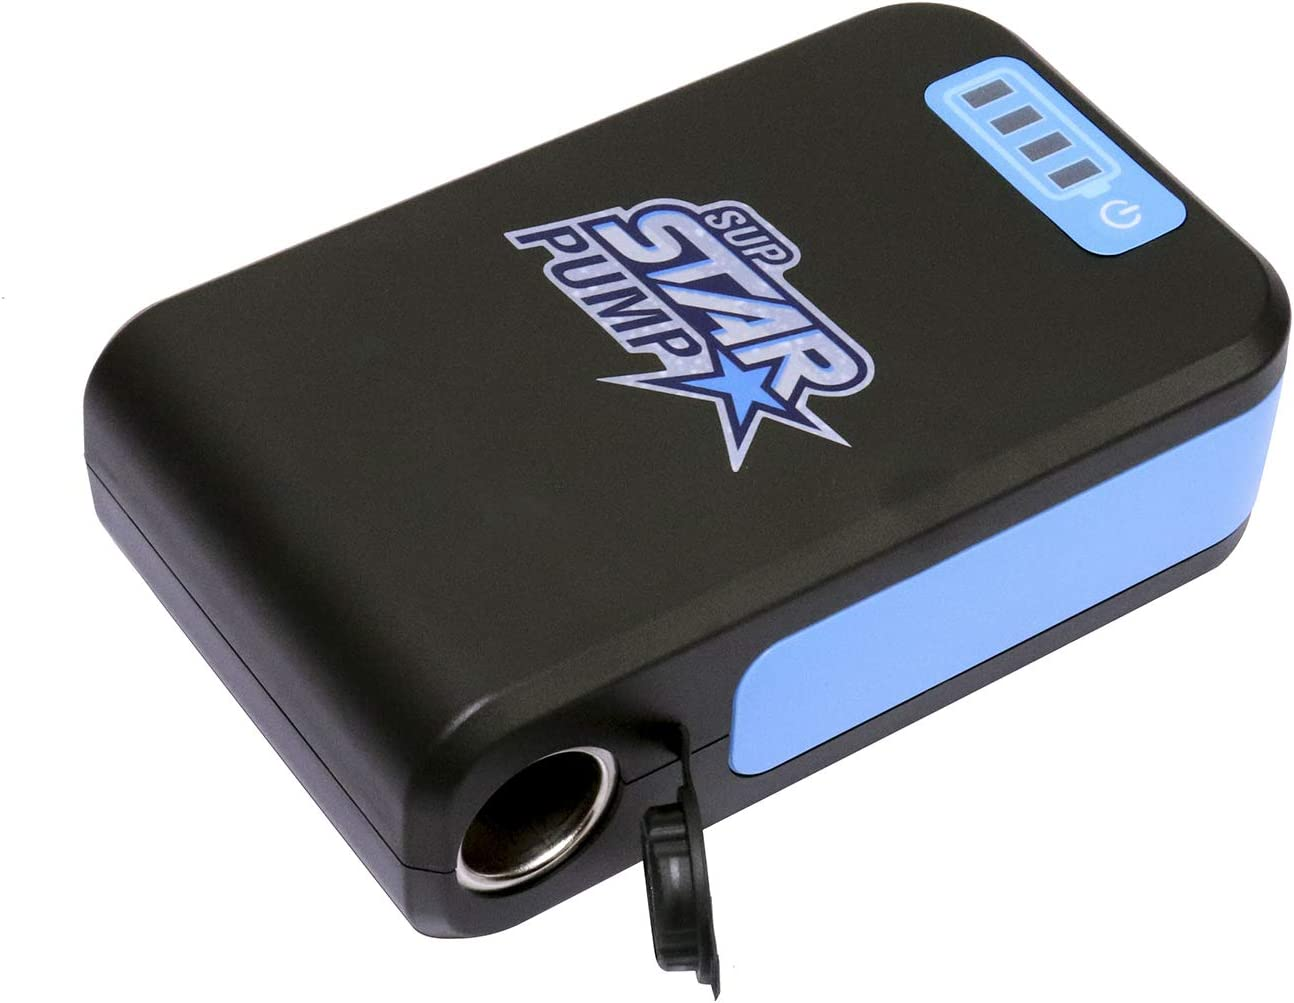 Star Pump 8 Sup Bomba 12v Super El/éctrico Bomba E-Pumpe con Bater/ía Powerbank